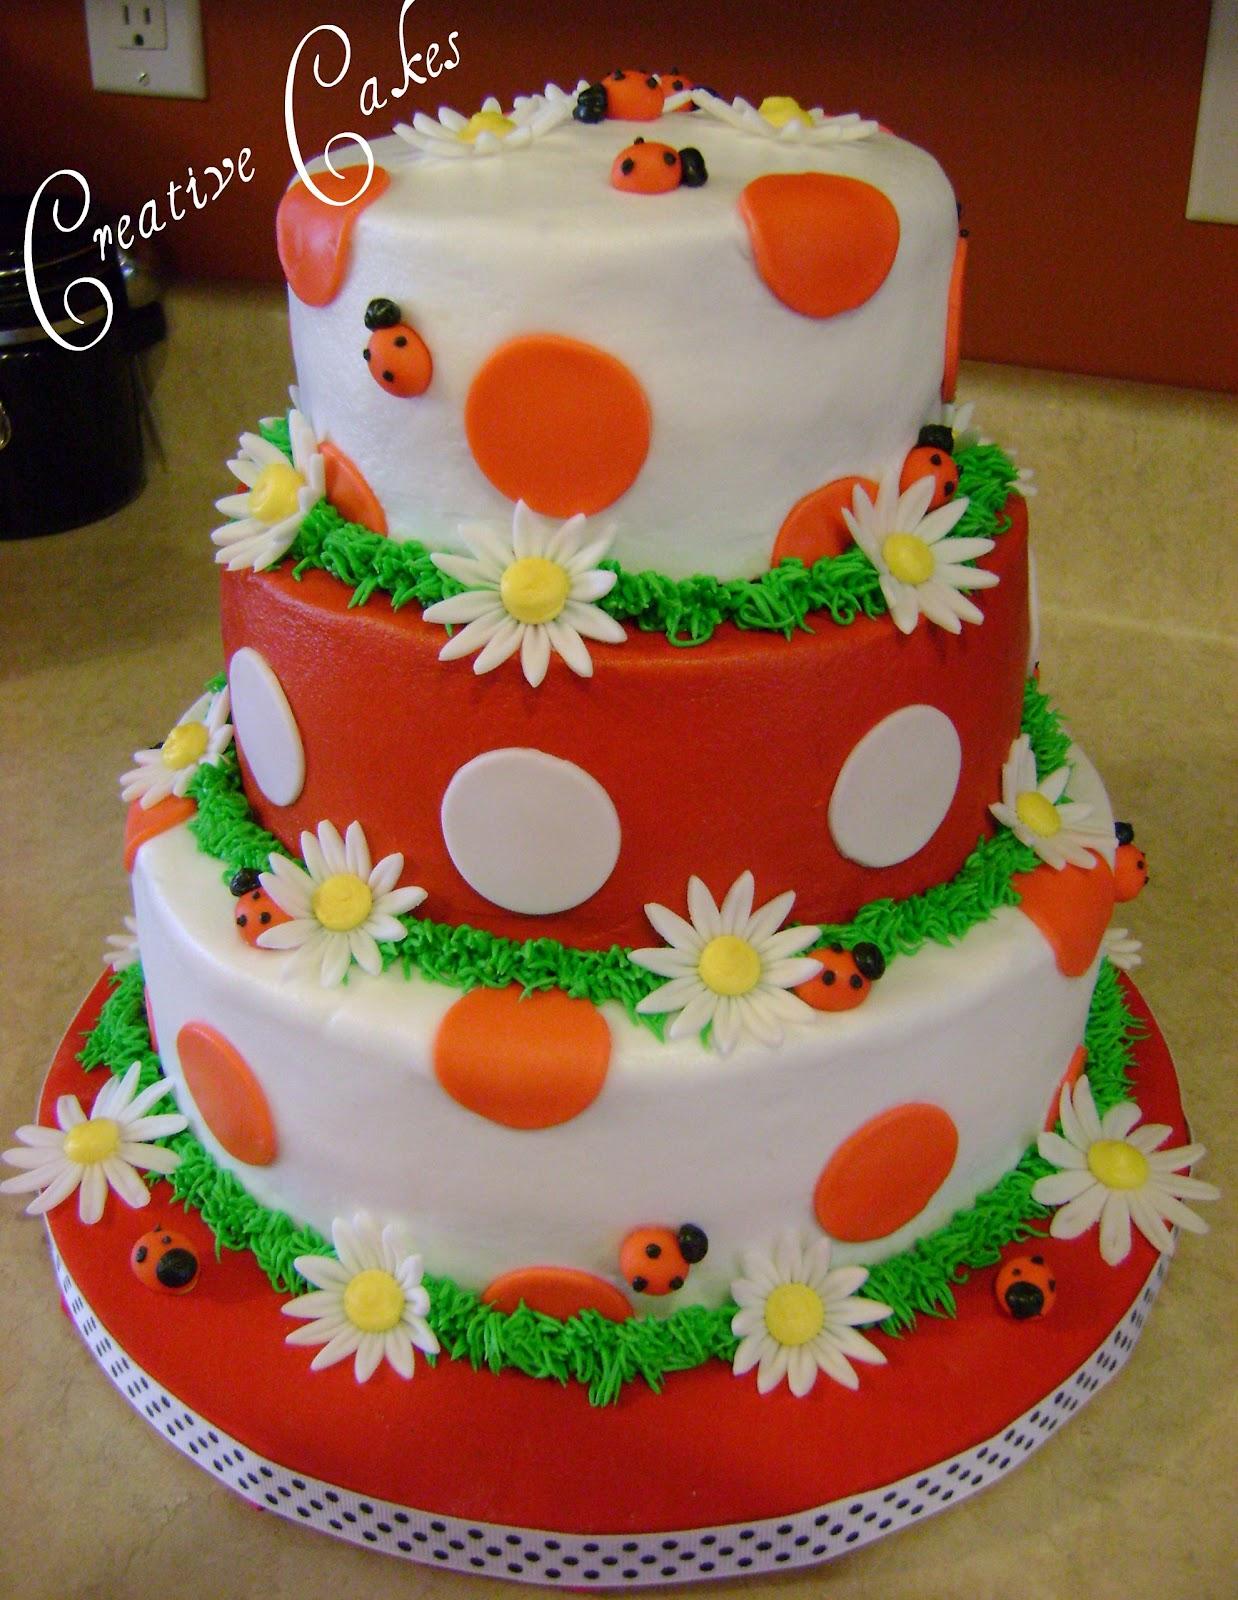 Creative cakes April 2012